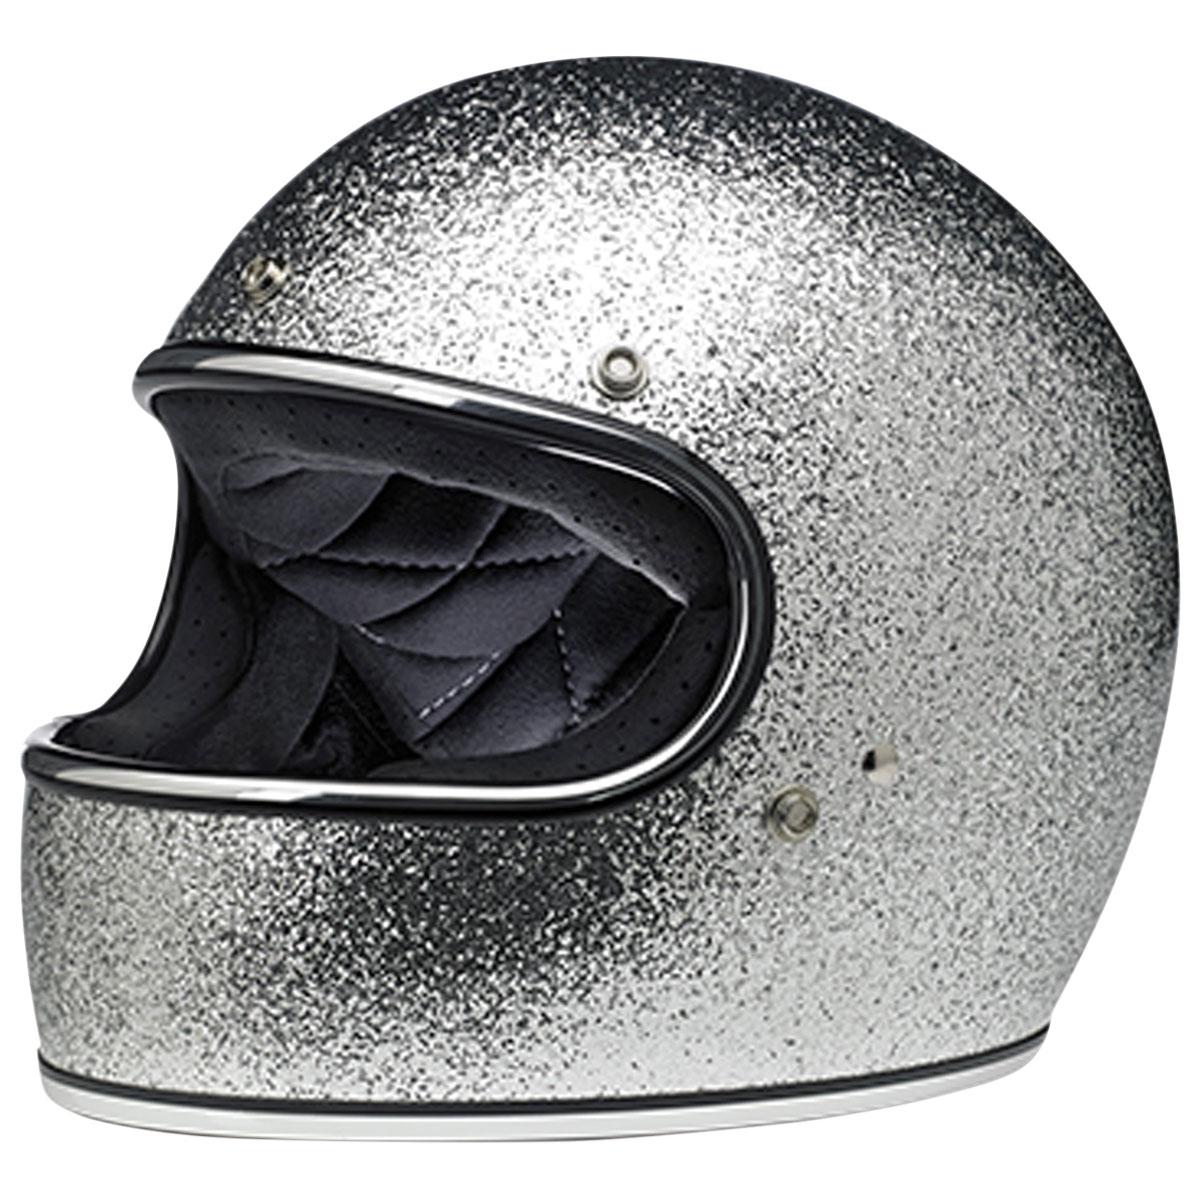 Biltwell Inc. Gringo DOT/ECE Bright Metallic Silver Full Face Helmet